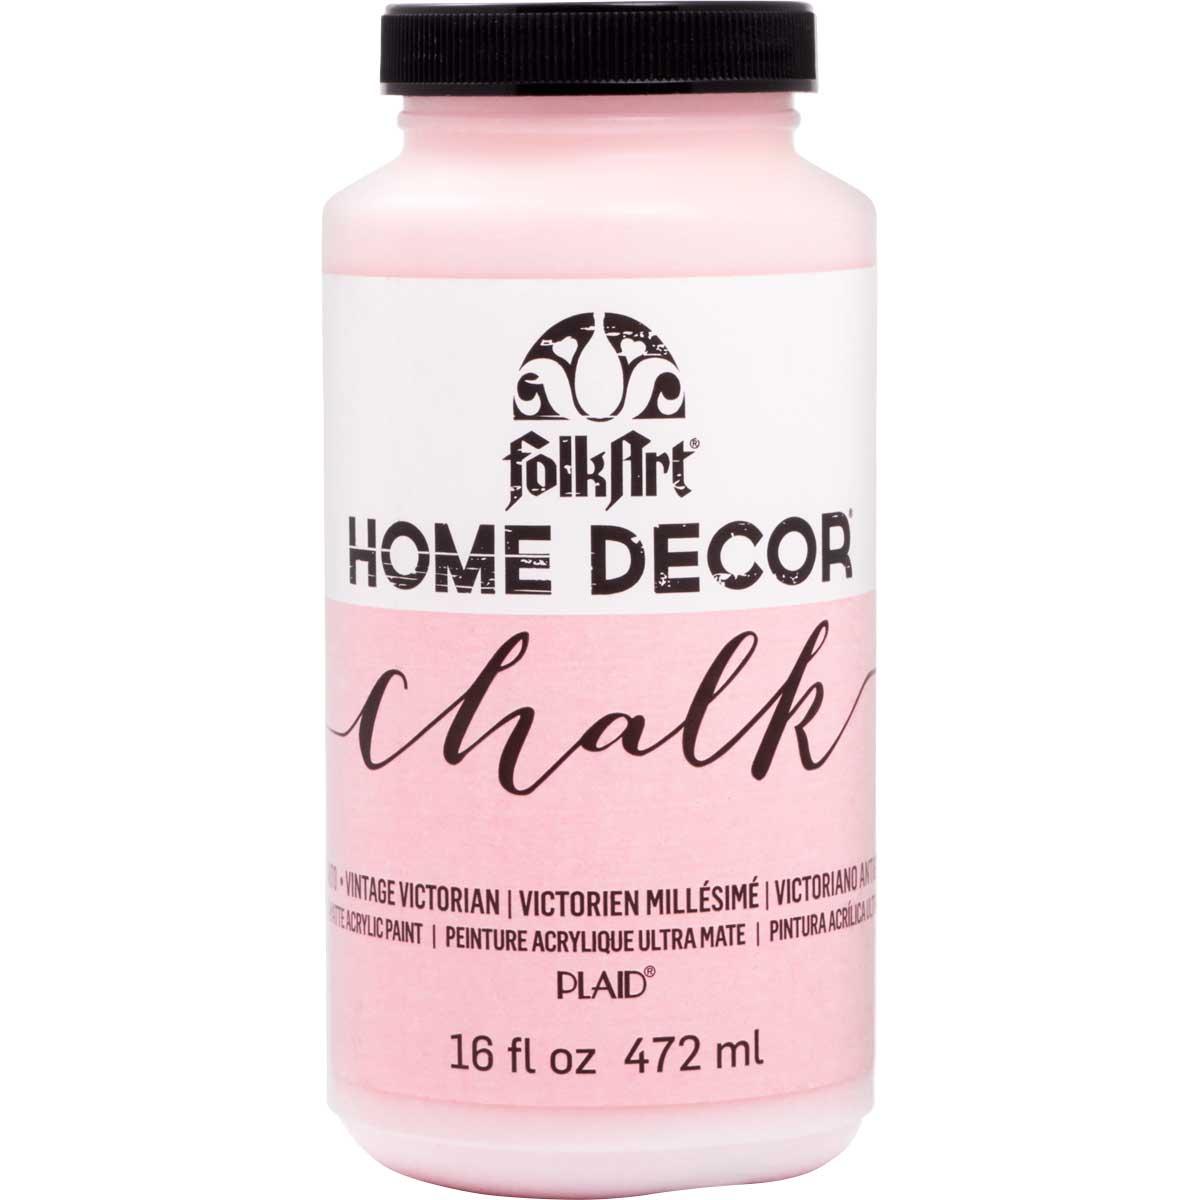 FolkArt ® Home Decor™ Chalk - Vintage Victorian, 16 oz.